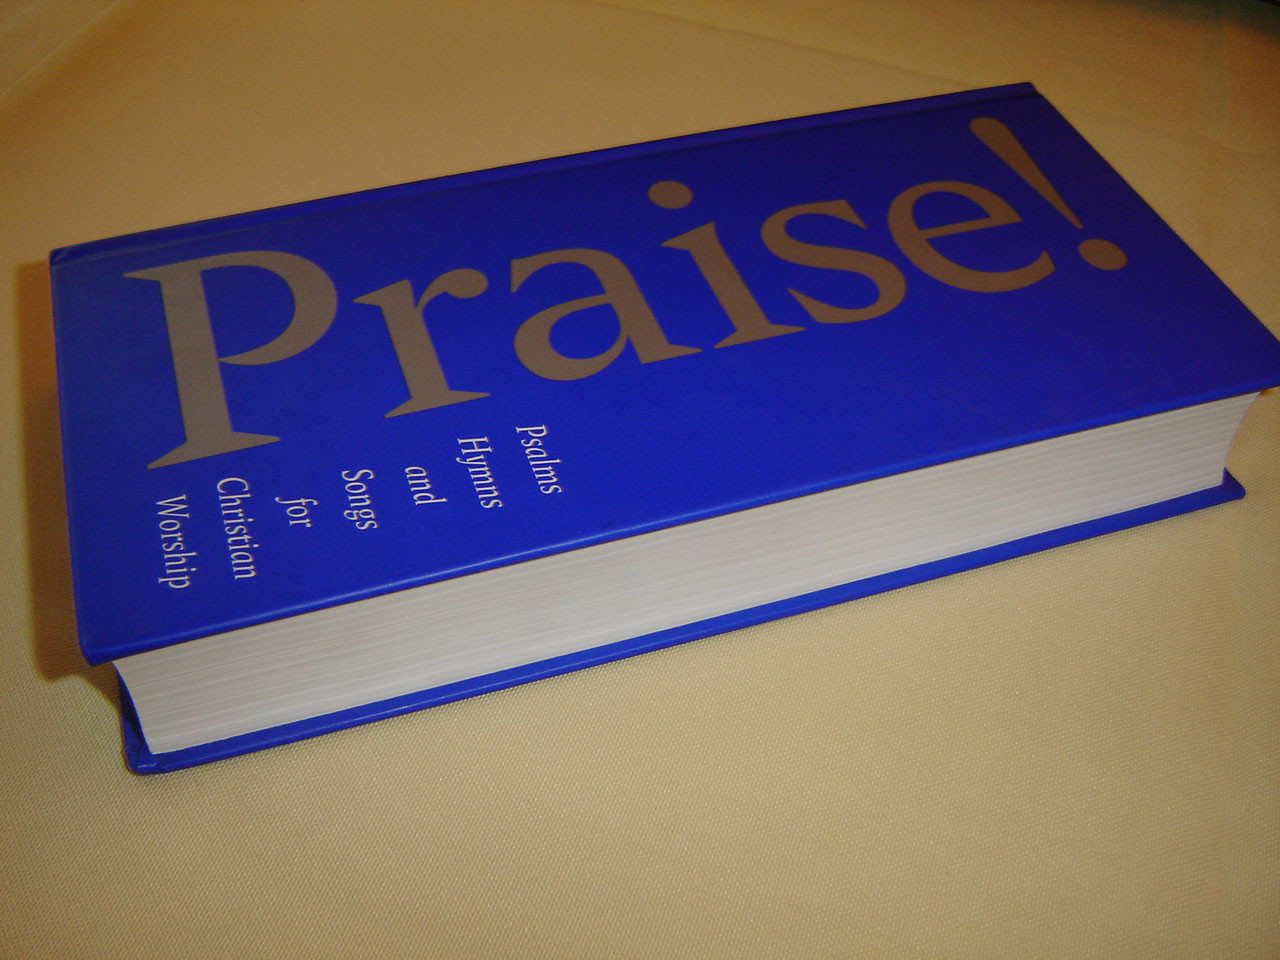 Praise! PSALMS HYMNS and SONGS for CHRISTIAN WORSHIP / Praise Trust